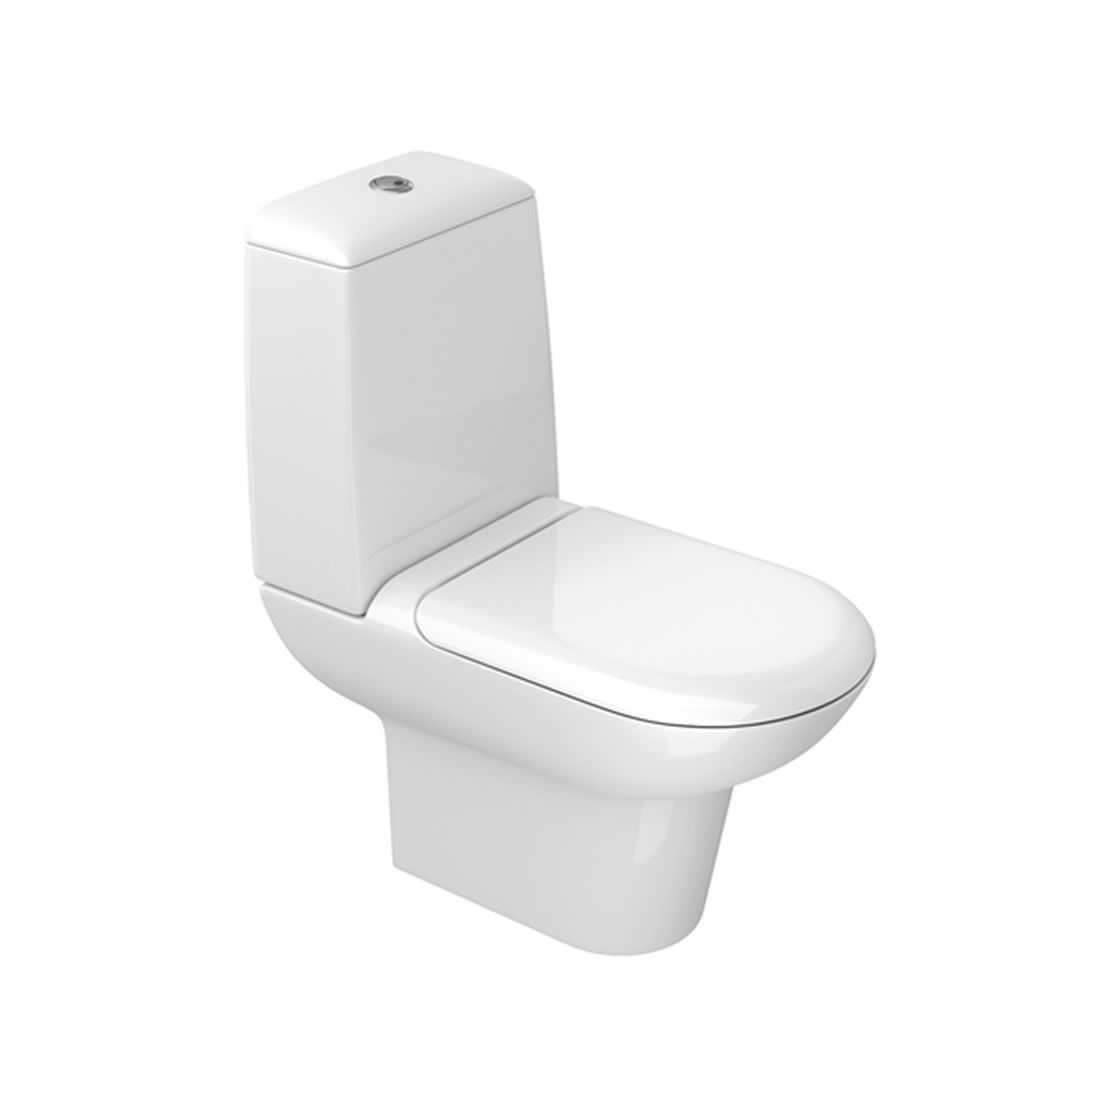 Conjunto Vaso Sanitário com Caixa Acoplada 3/6L Ecoflush Duomo Plus Branco Deca